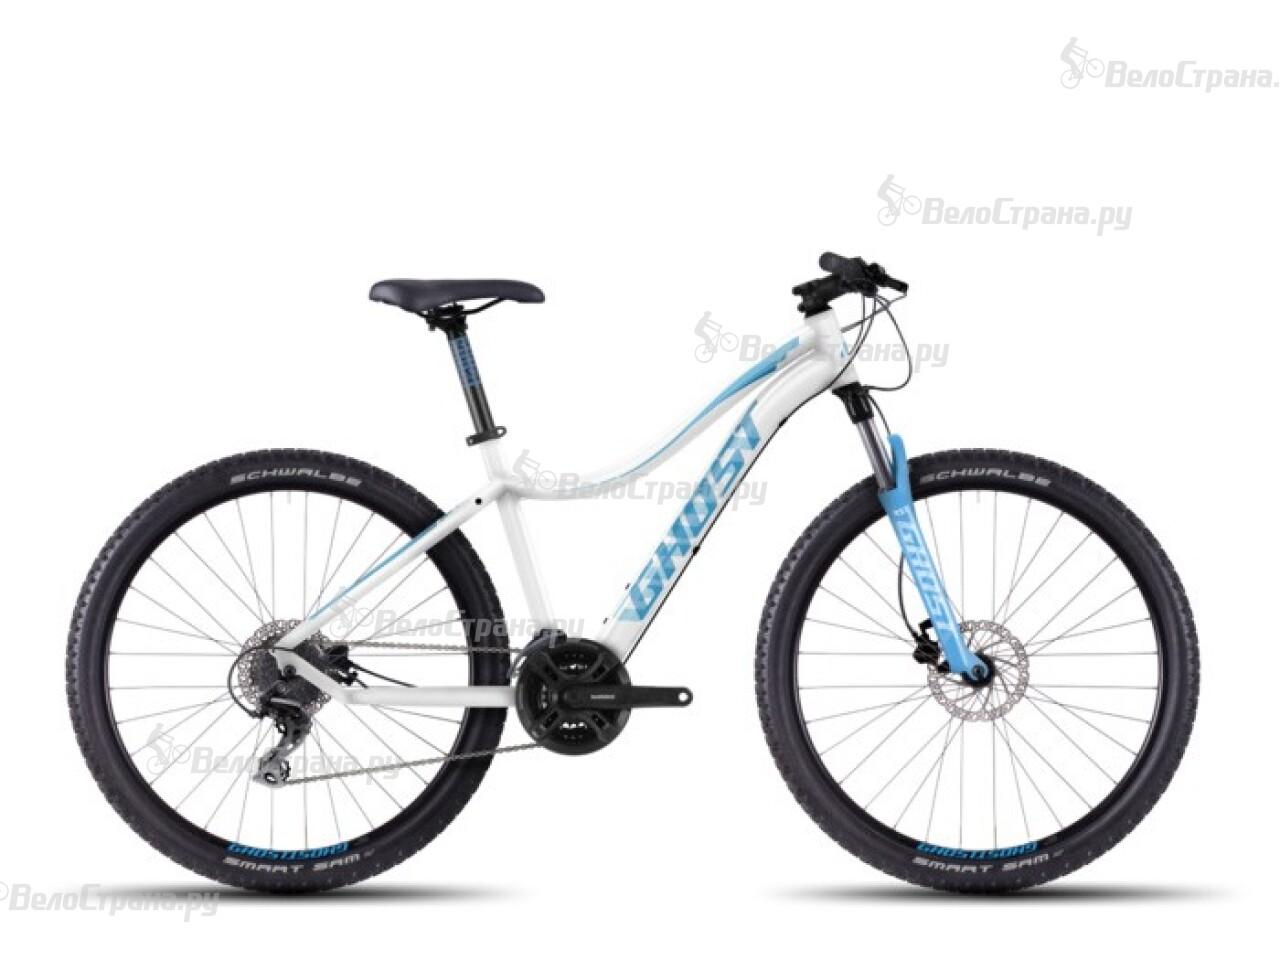 Велосипед Ghost Lanao 2 (2016) велосипед ghost lanao 3 2015